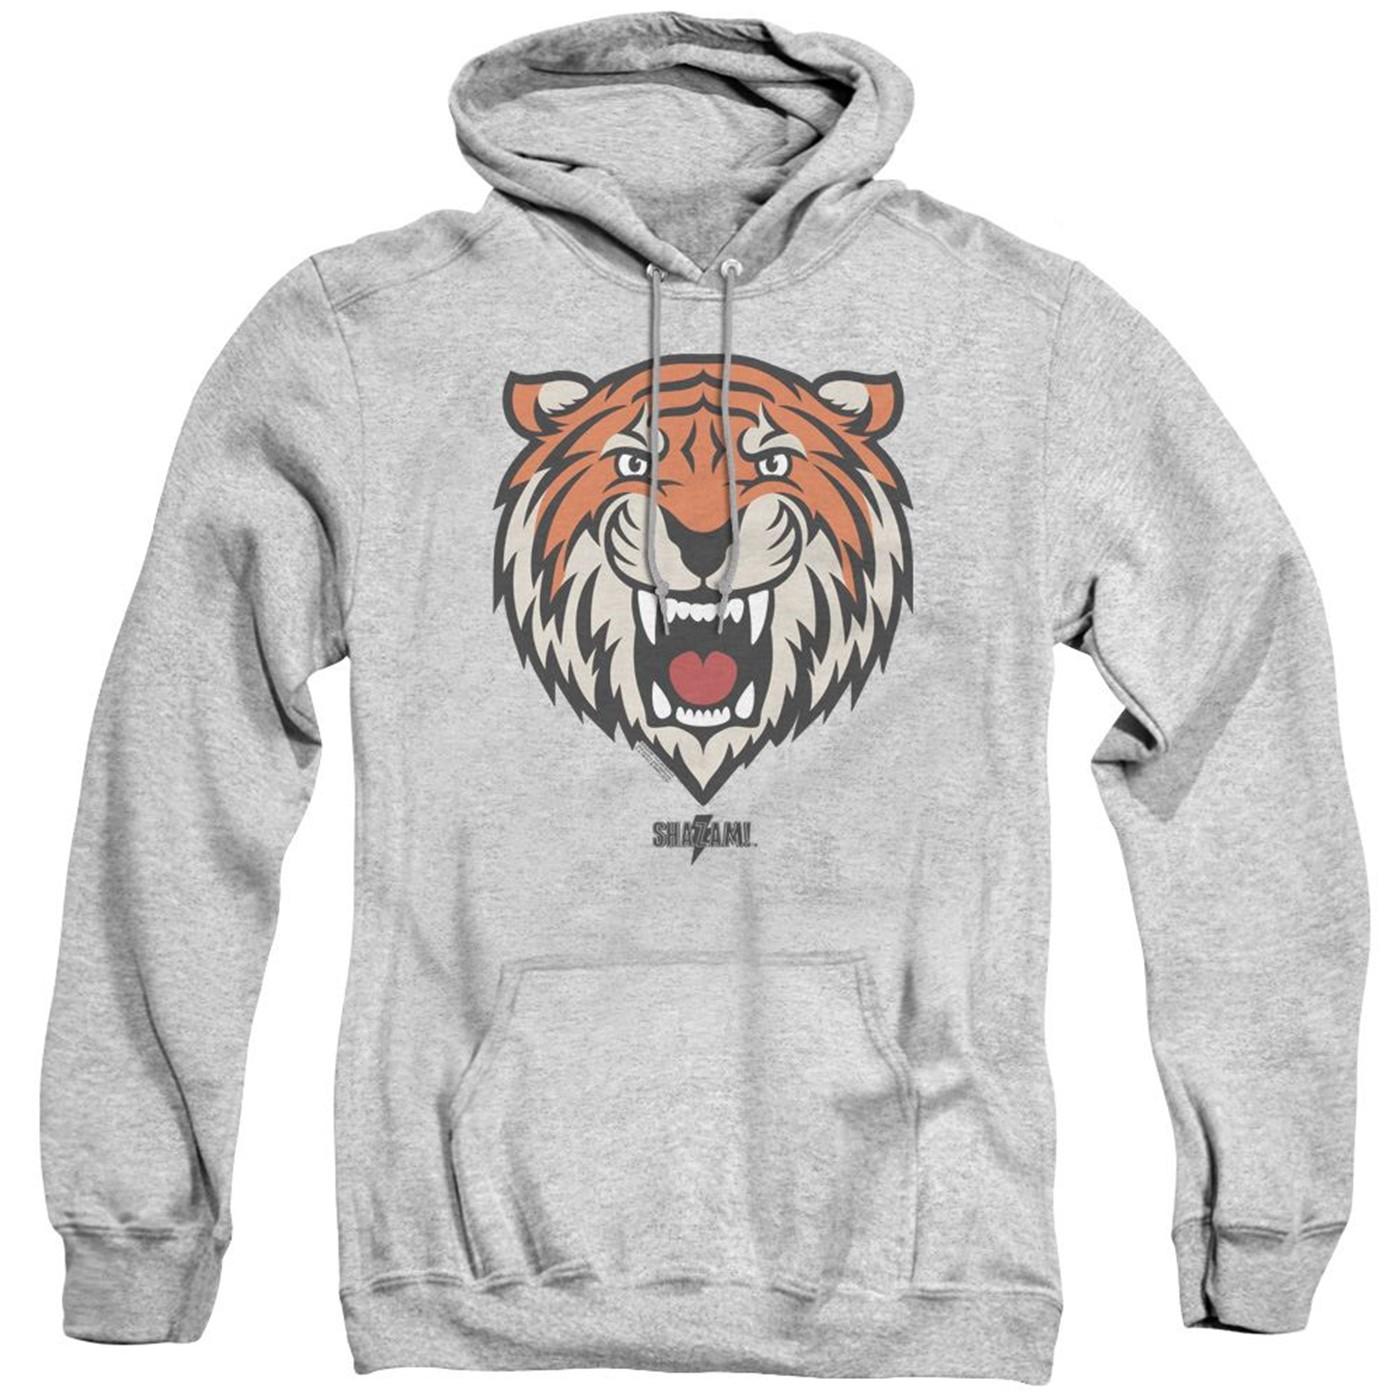 Shazam Tawky Tawny Tiger Hoodie